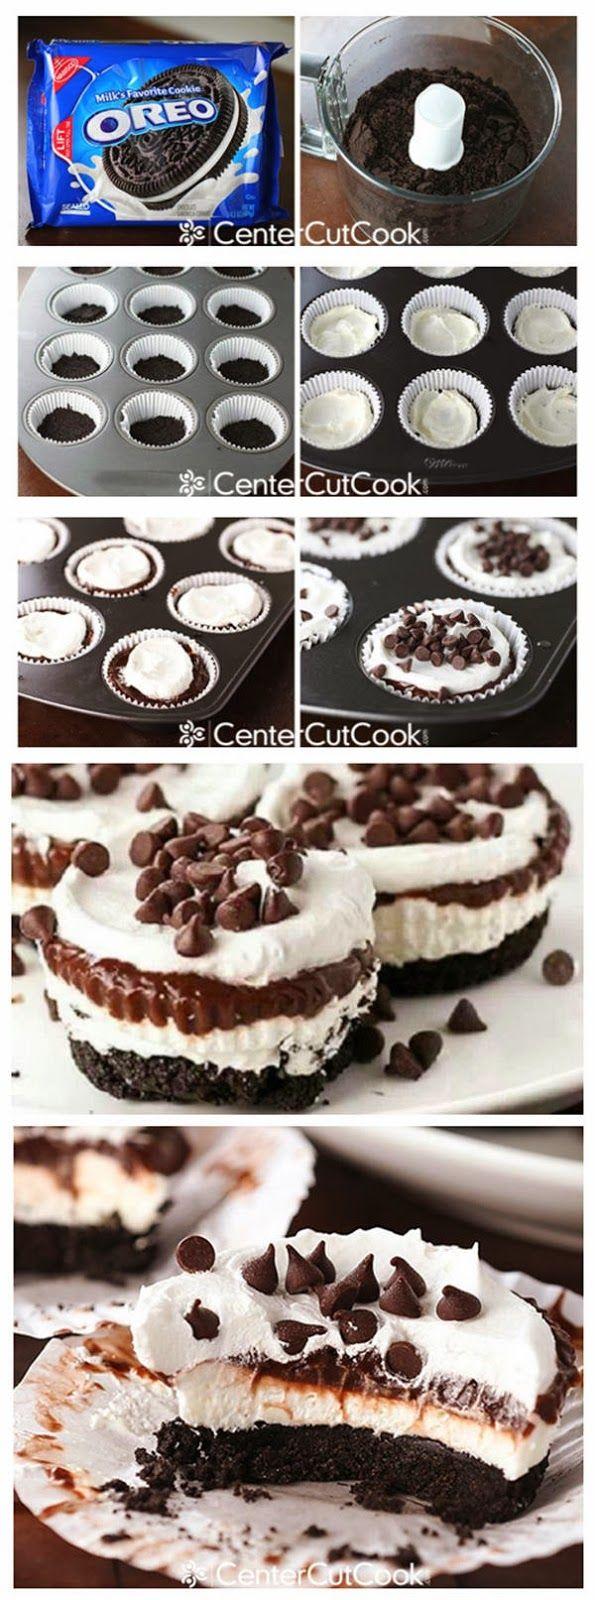 Chocolate Cream Cupcakes Sin coccion. Con Oreo queso crema,Cool Whip y un paquete de Pudding instantaneo. PROBAR